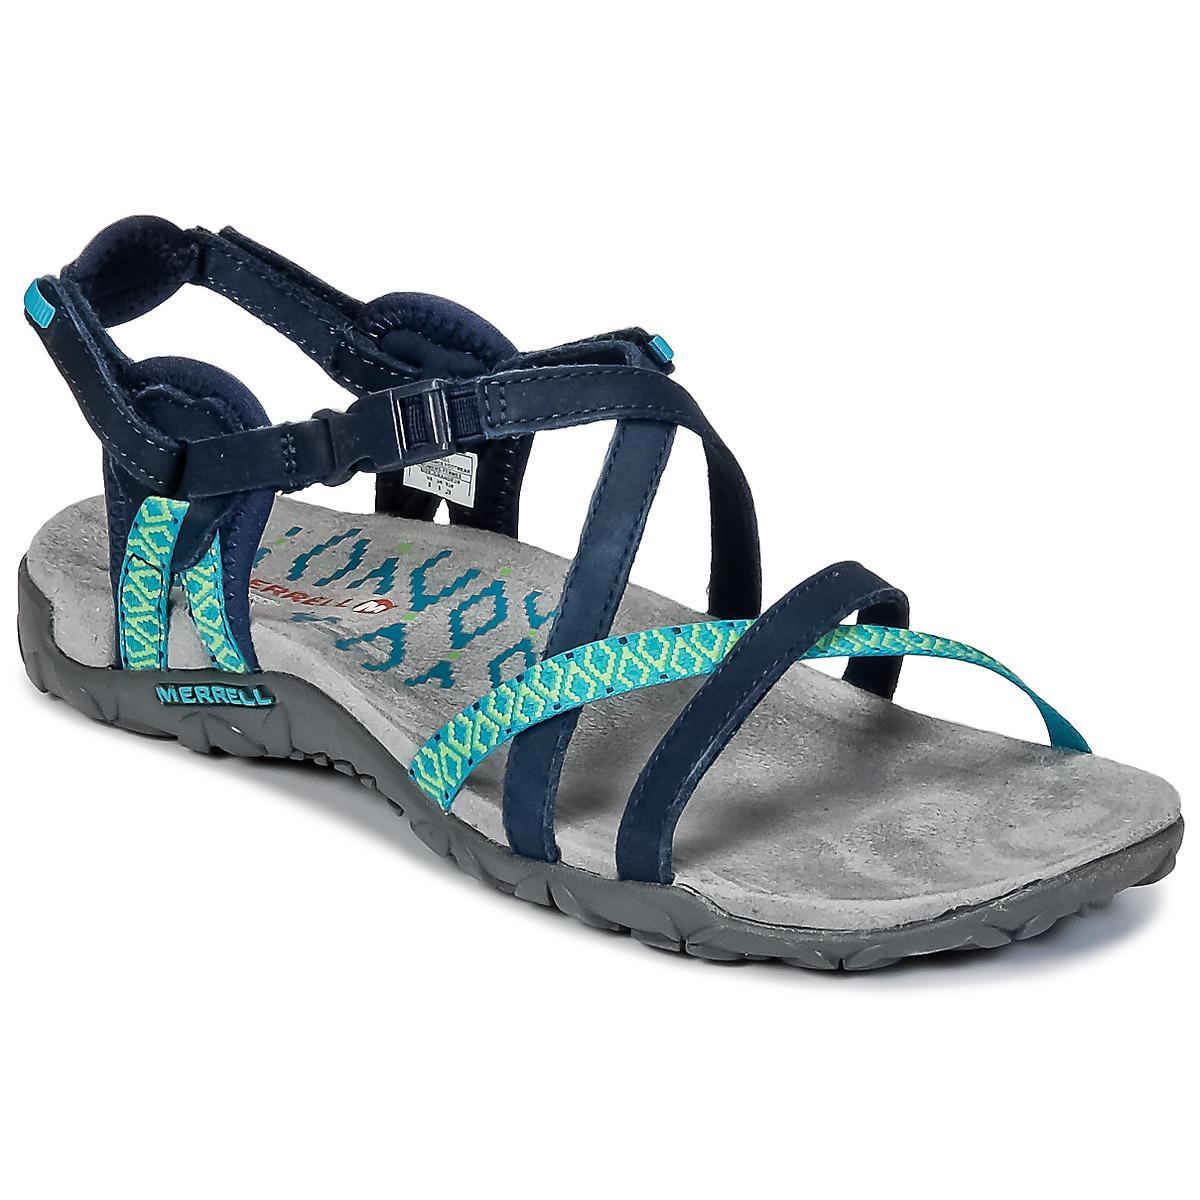 3cc14a093faf Merrell - Blue Terran Lattice Ii Sandals - Lyst. View fullscreen